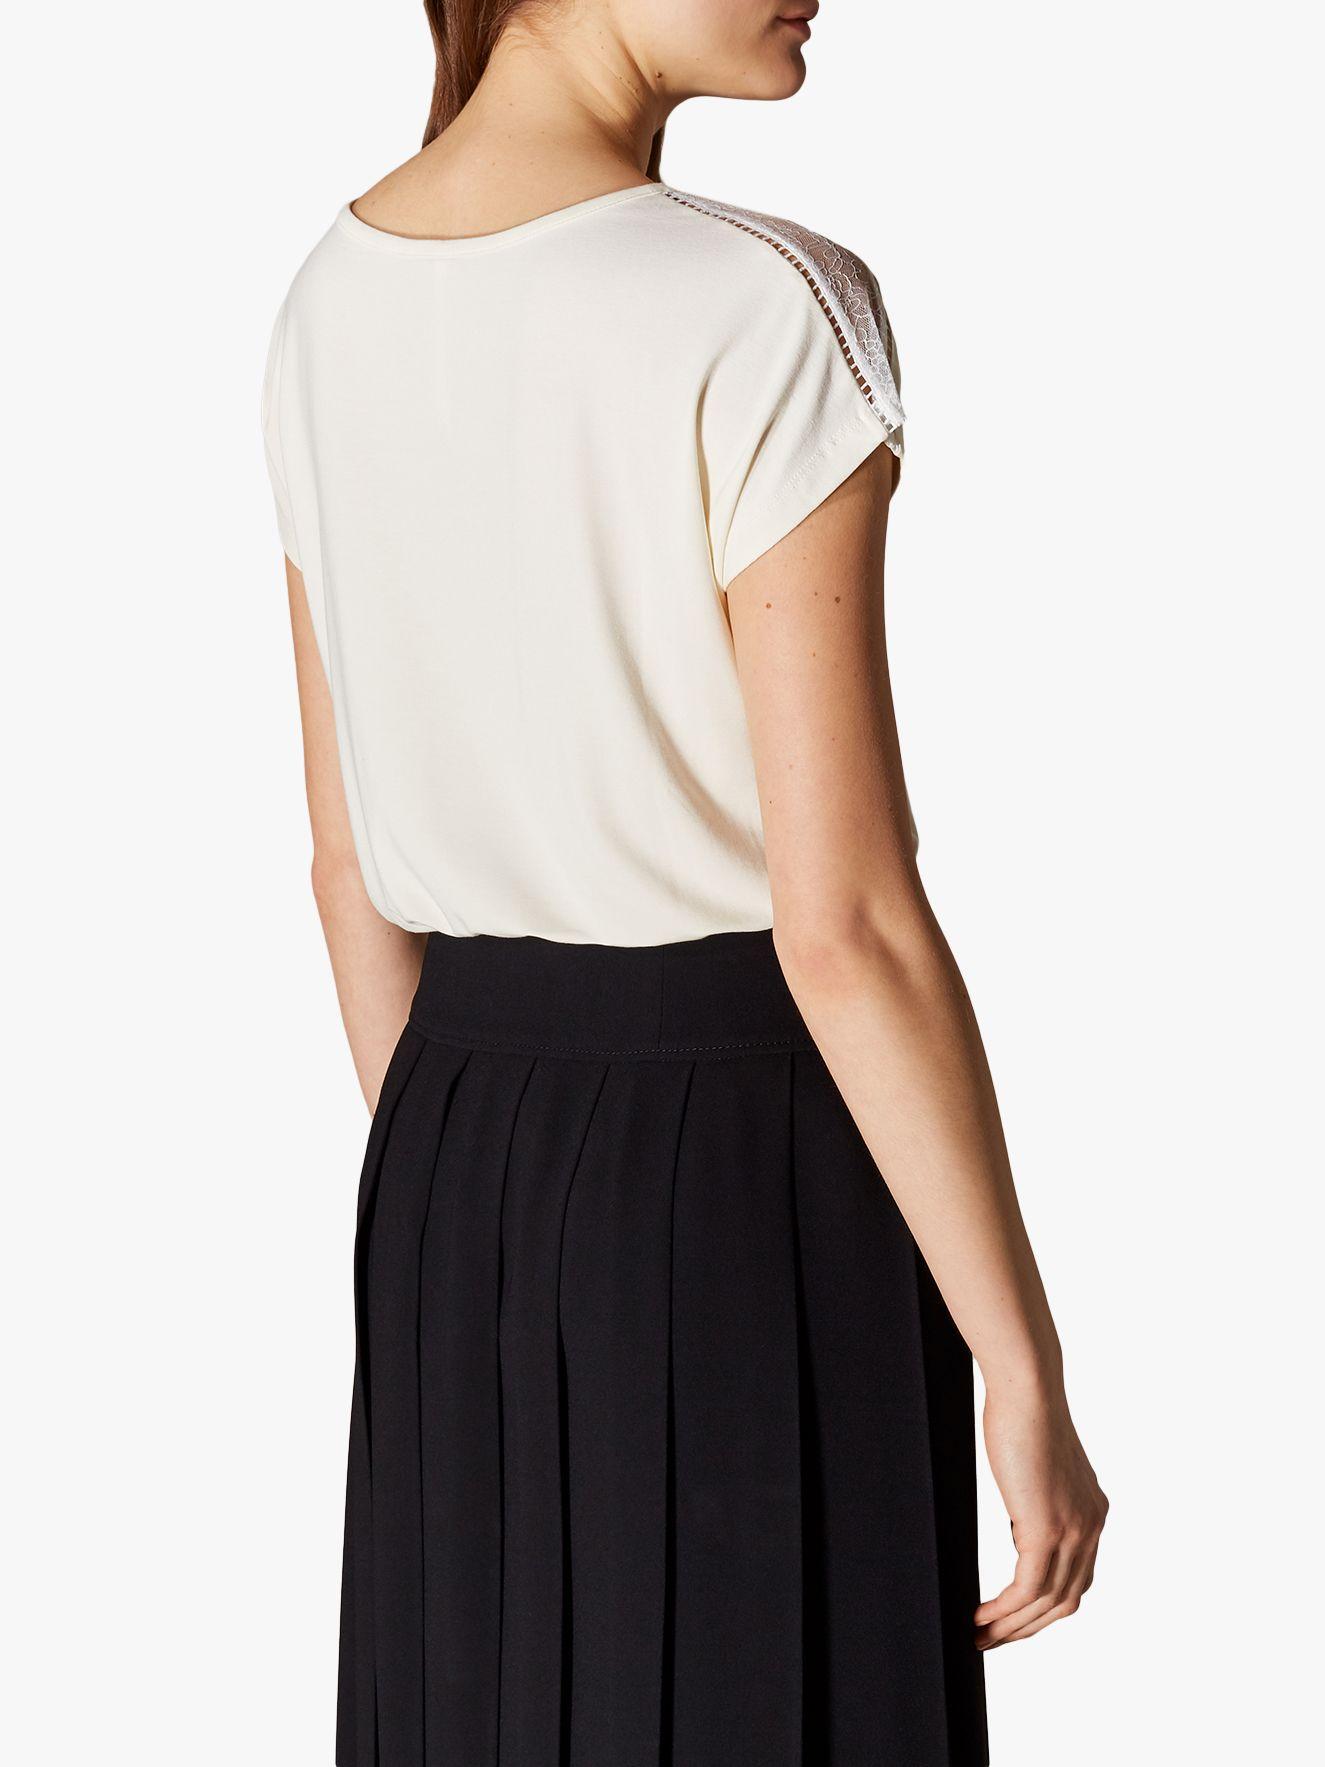 2b392416 Karen Millen Lace Panel T-shirt in White - Lyst